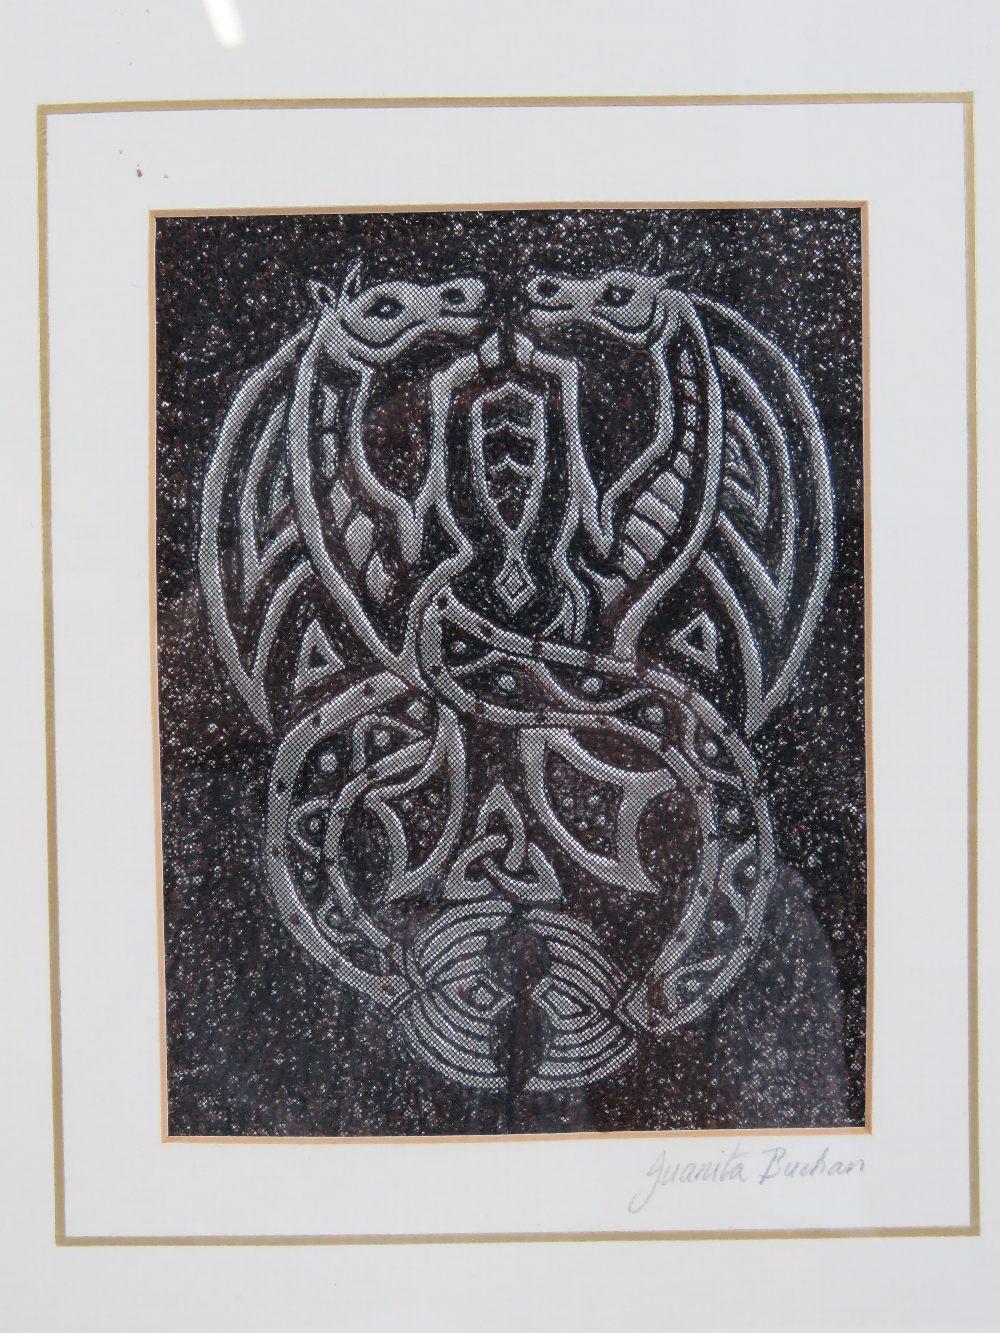 Lot 510 - Juanita Buchan; a framed abstract relief